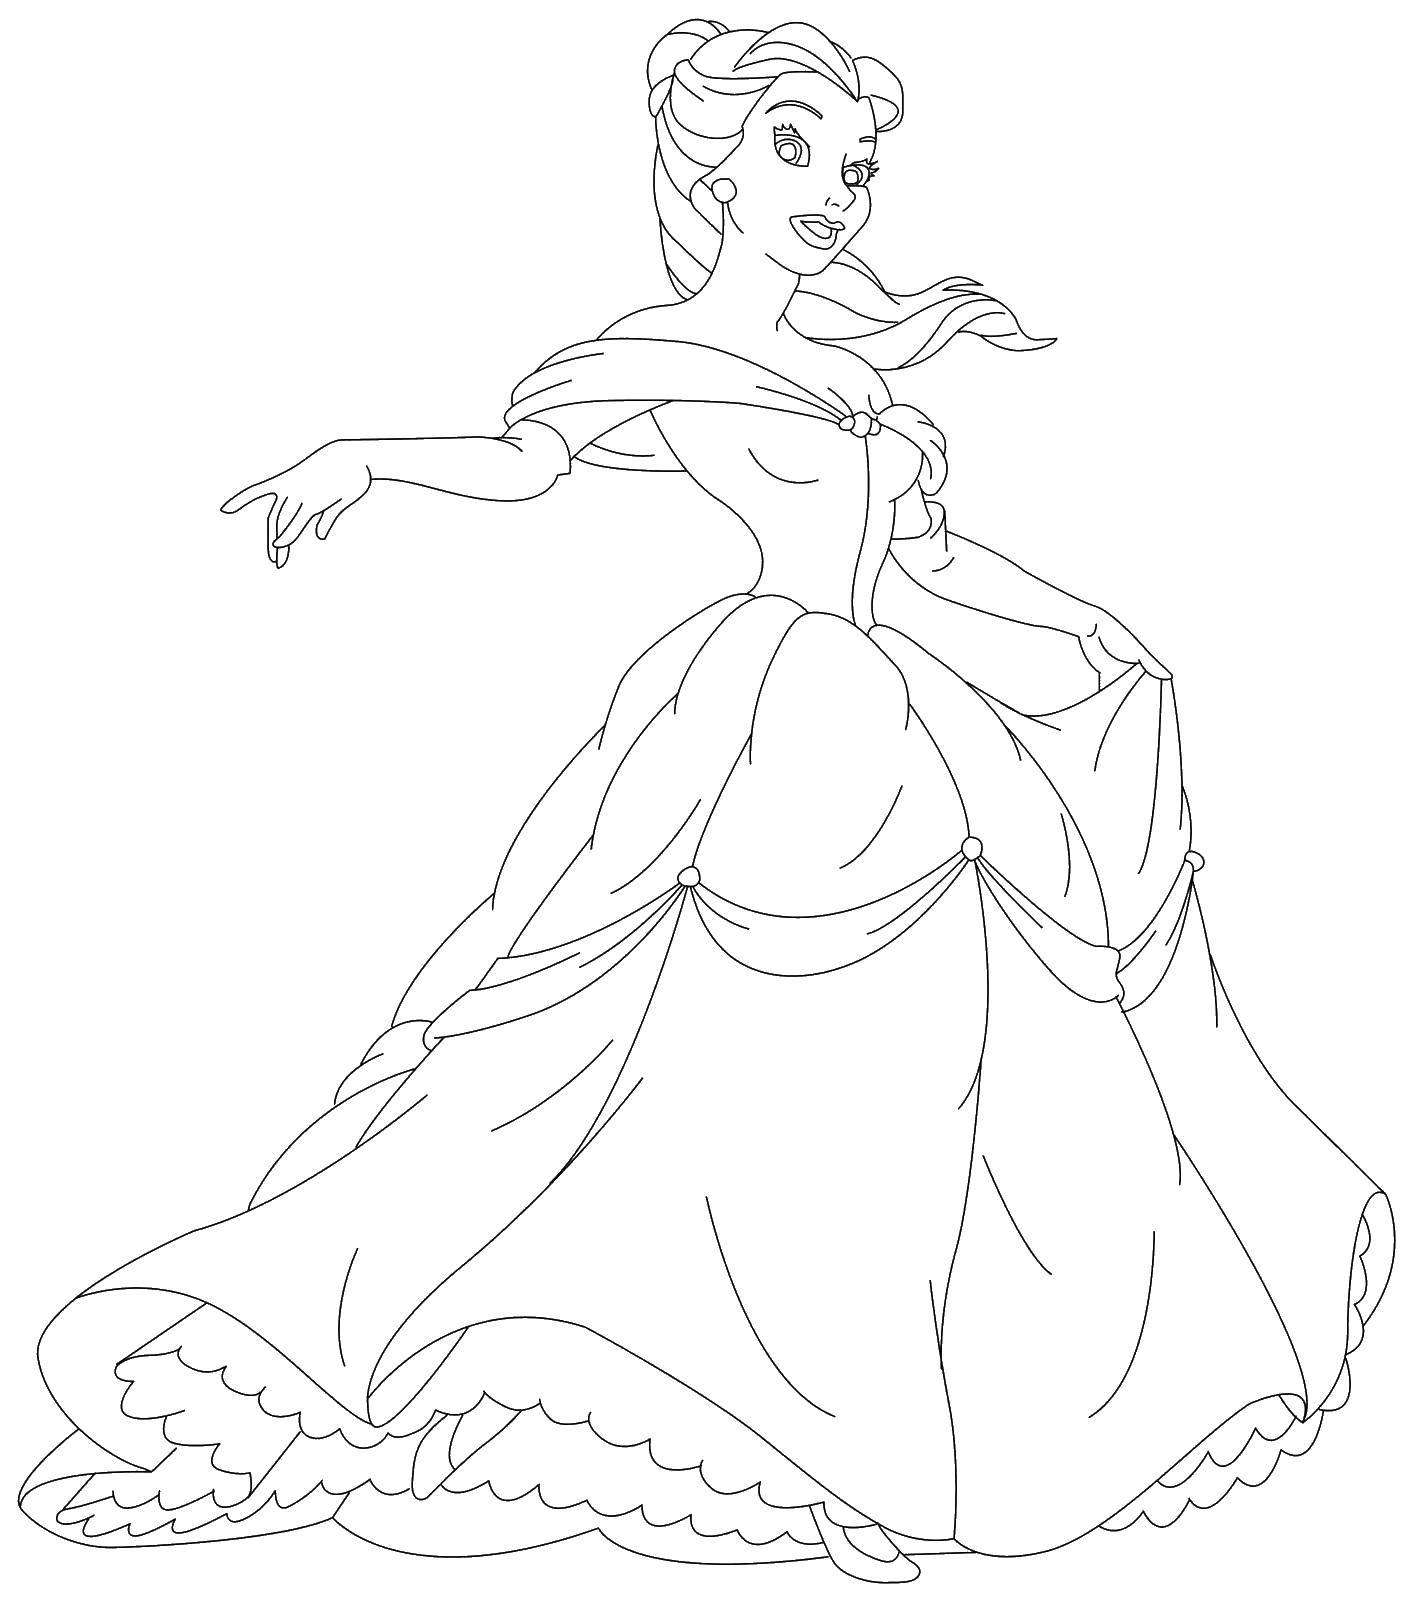 Раскраски принцесса, Раскраска Принцесса в бальном платье ...